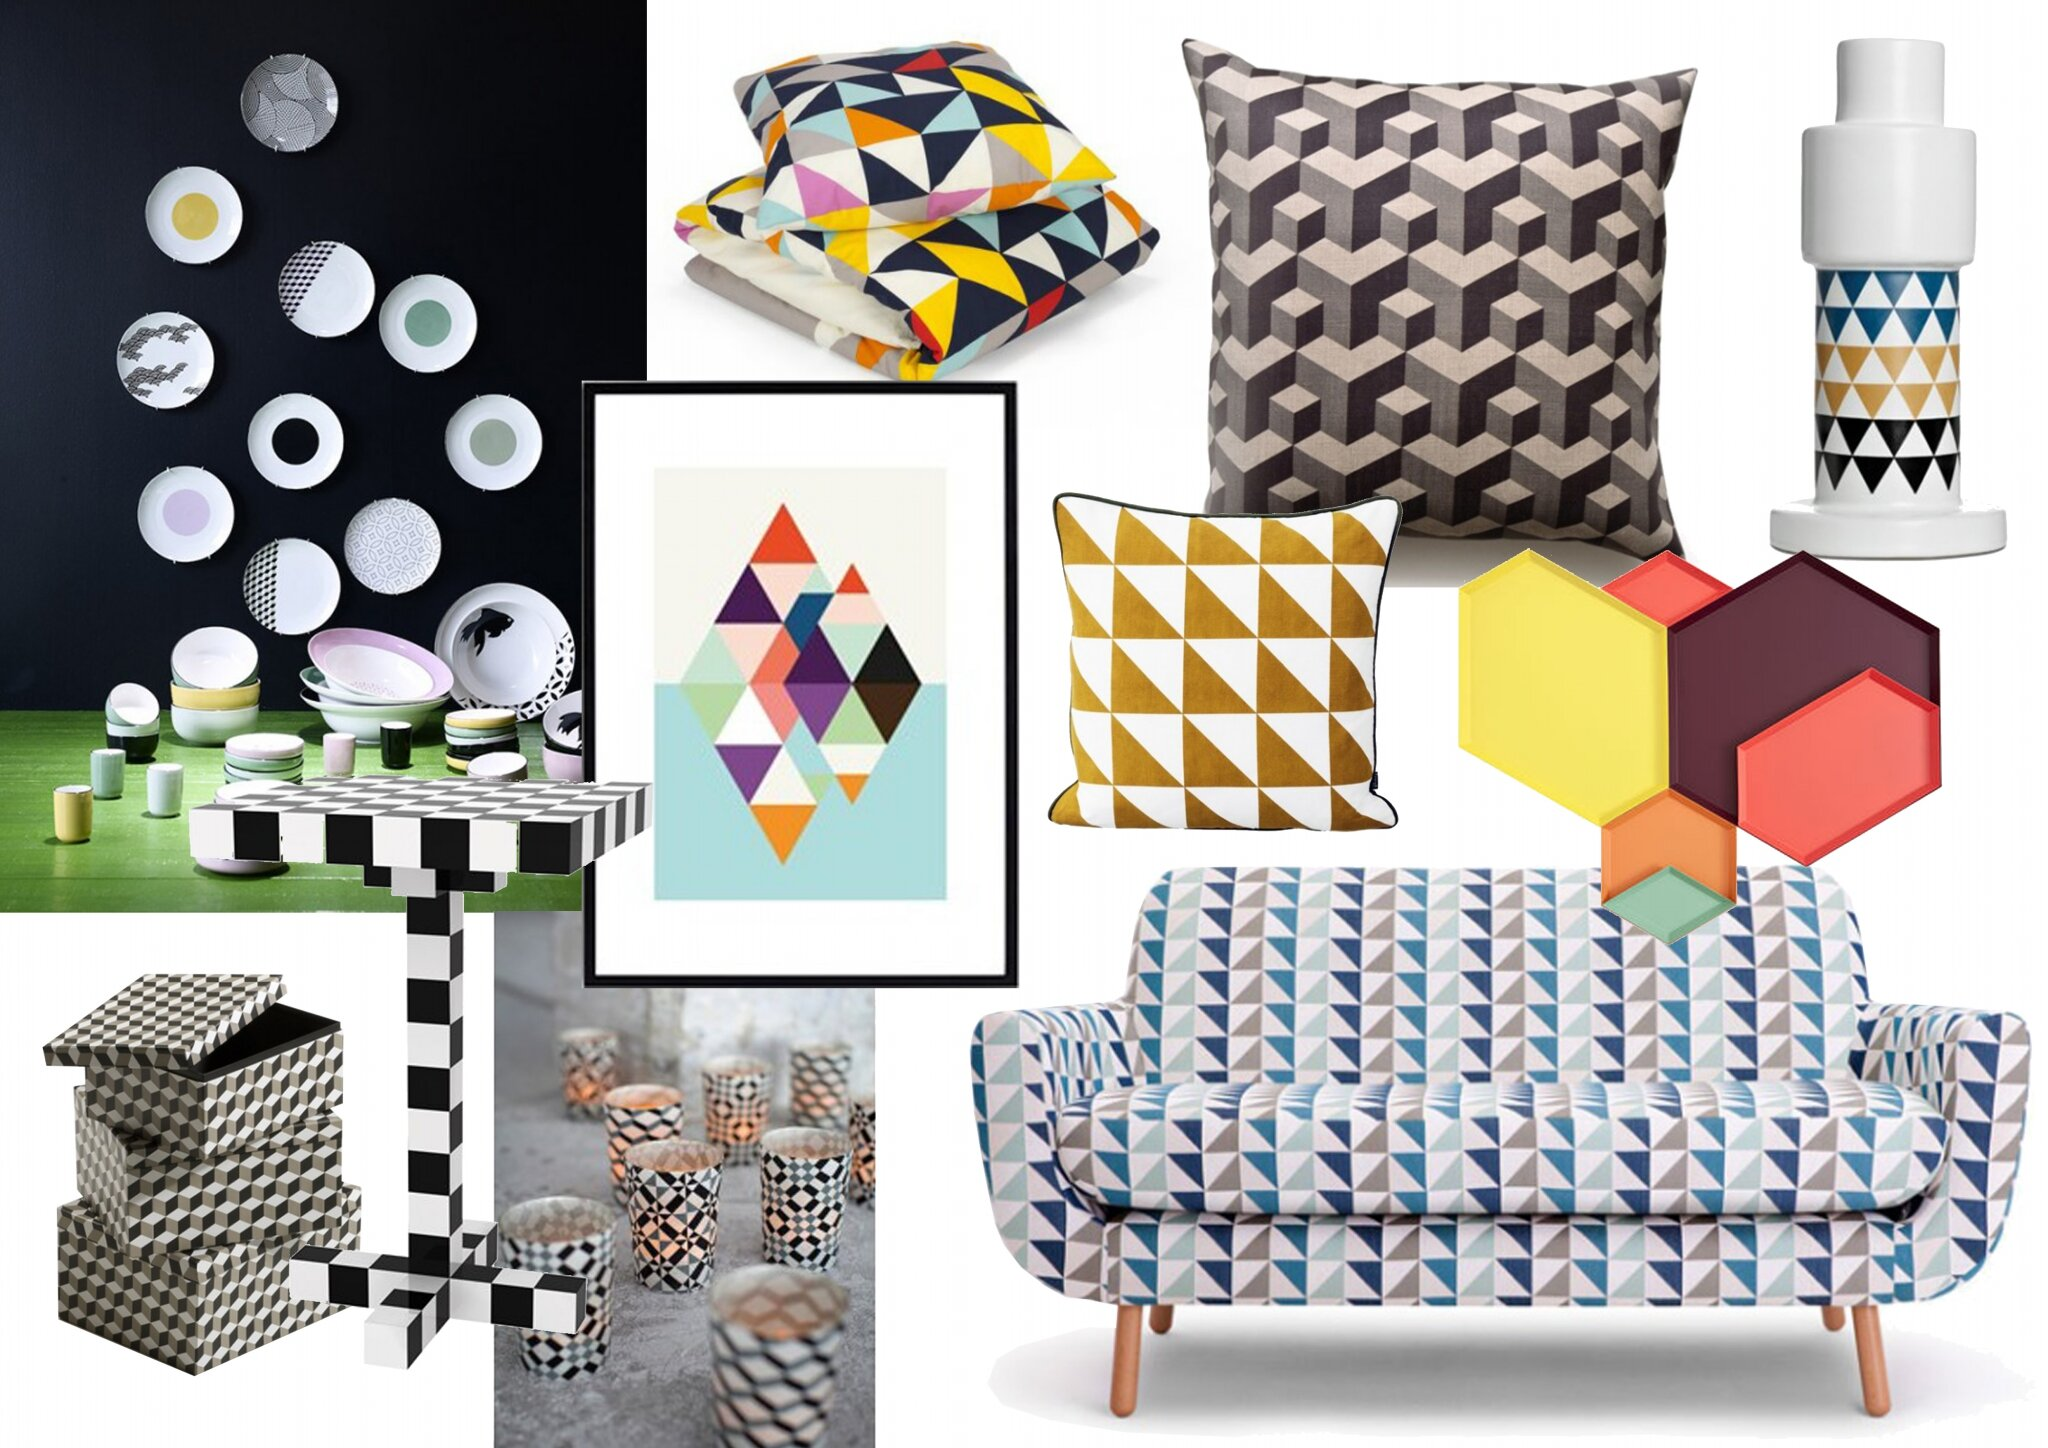 assiette trendig ikea lot de boites de rangement gigogne la redoute table dappoint chess conran. Black Bedroom Furniture Sets. Home Design Ideas